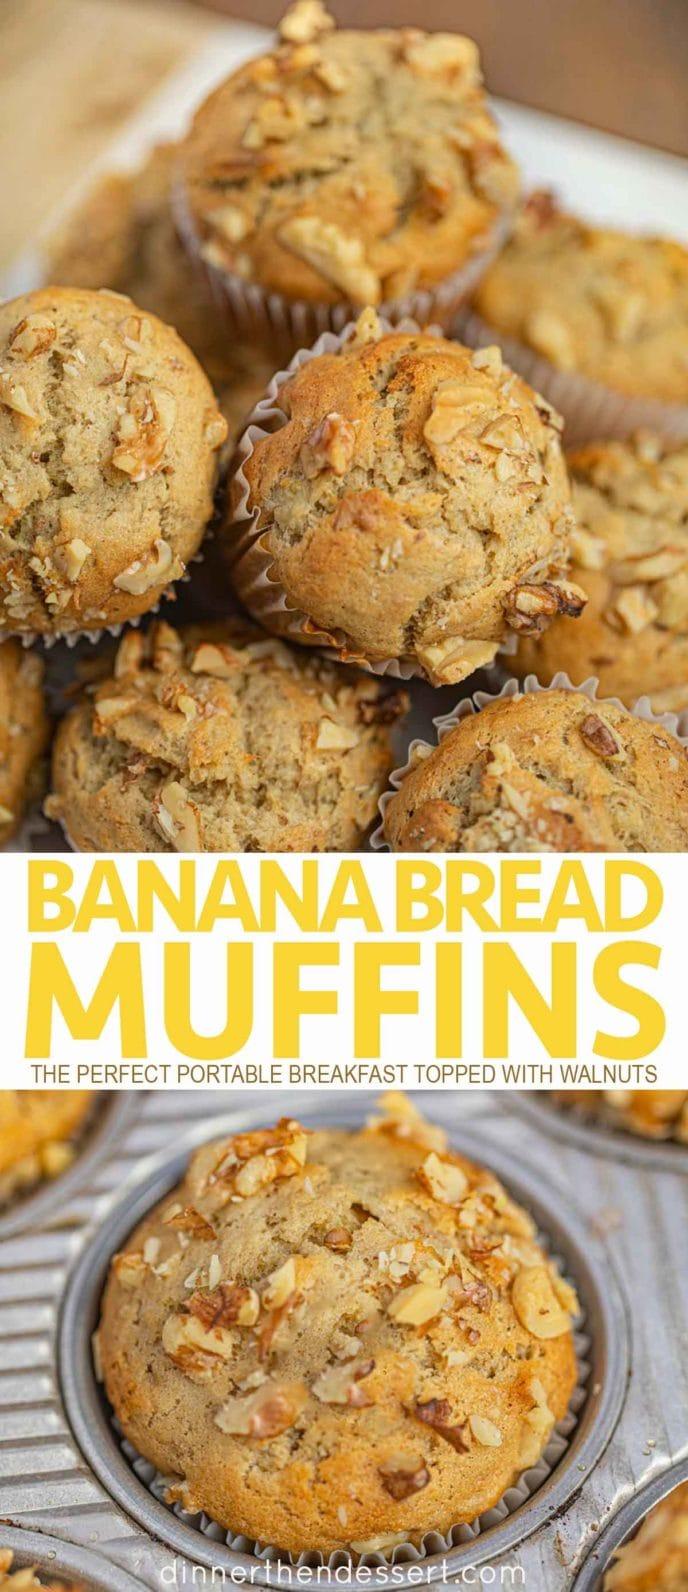 Banana Bread Muffins with walnuts